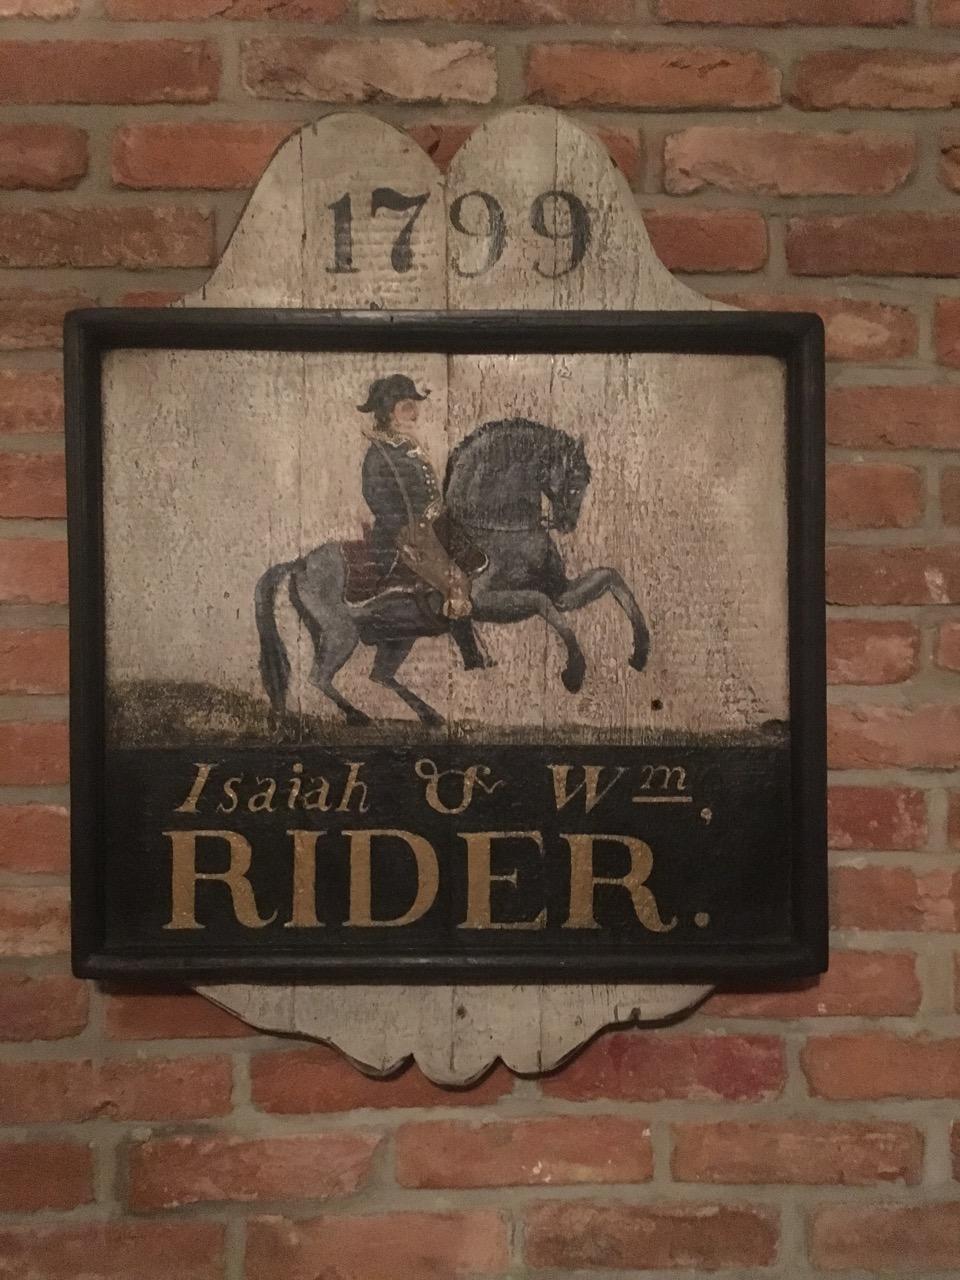 colonial american tavern sign - 1 (1).jpg